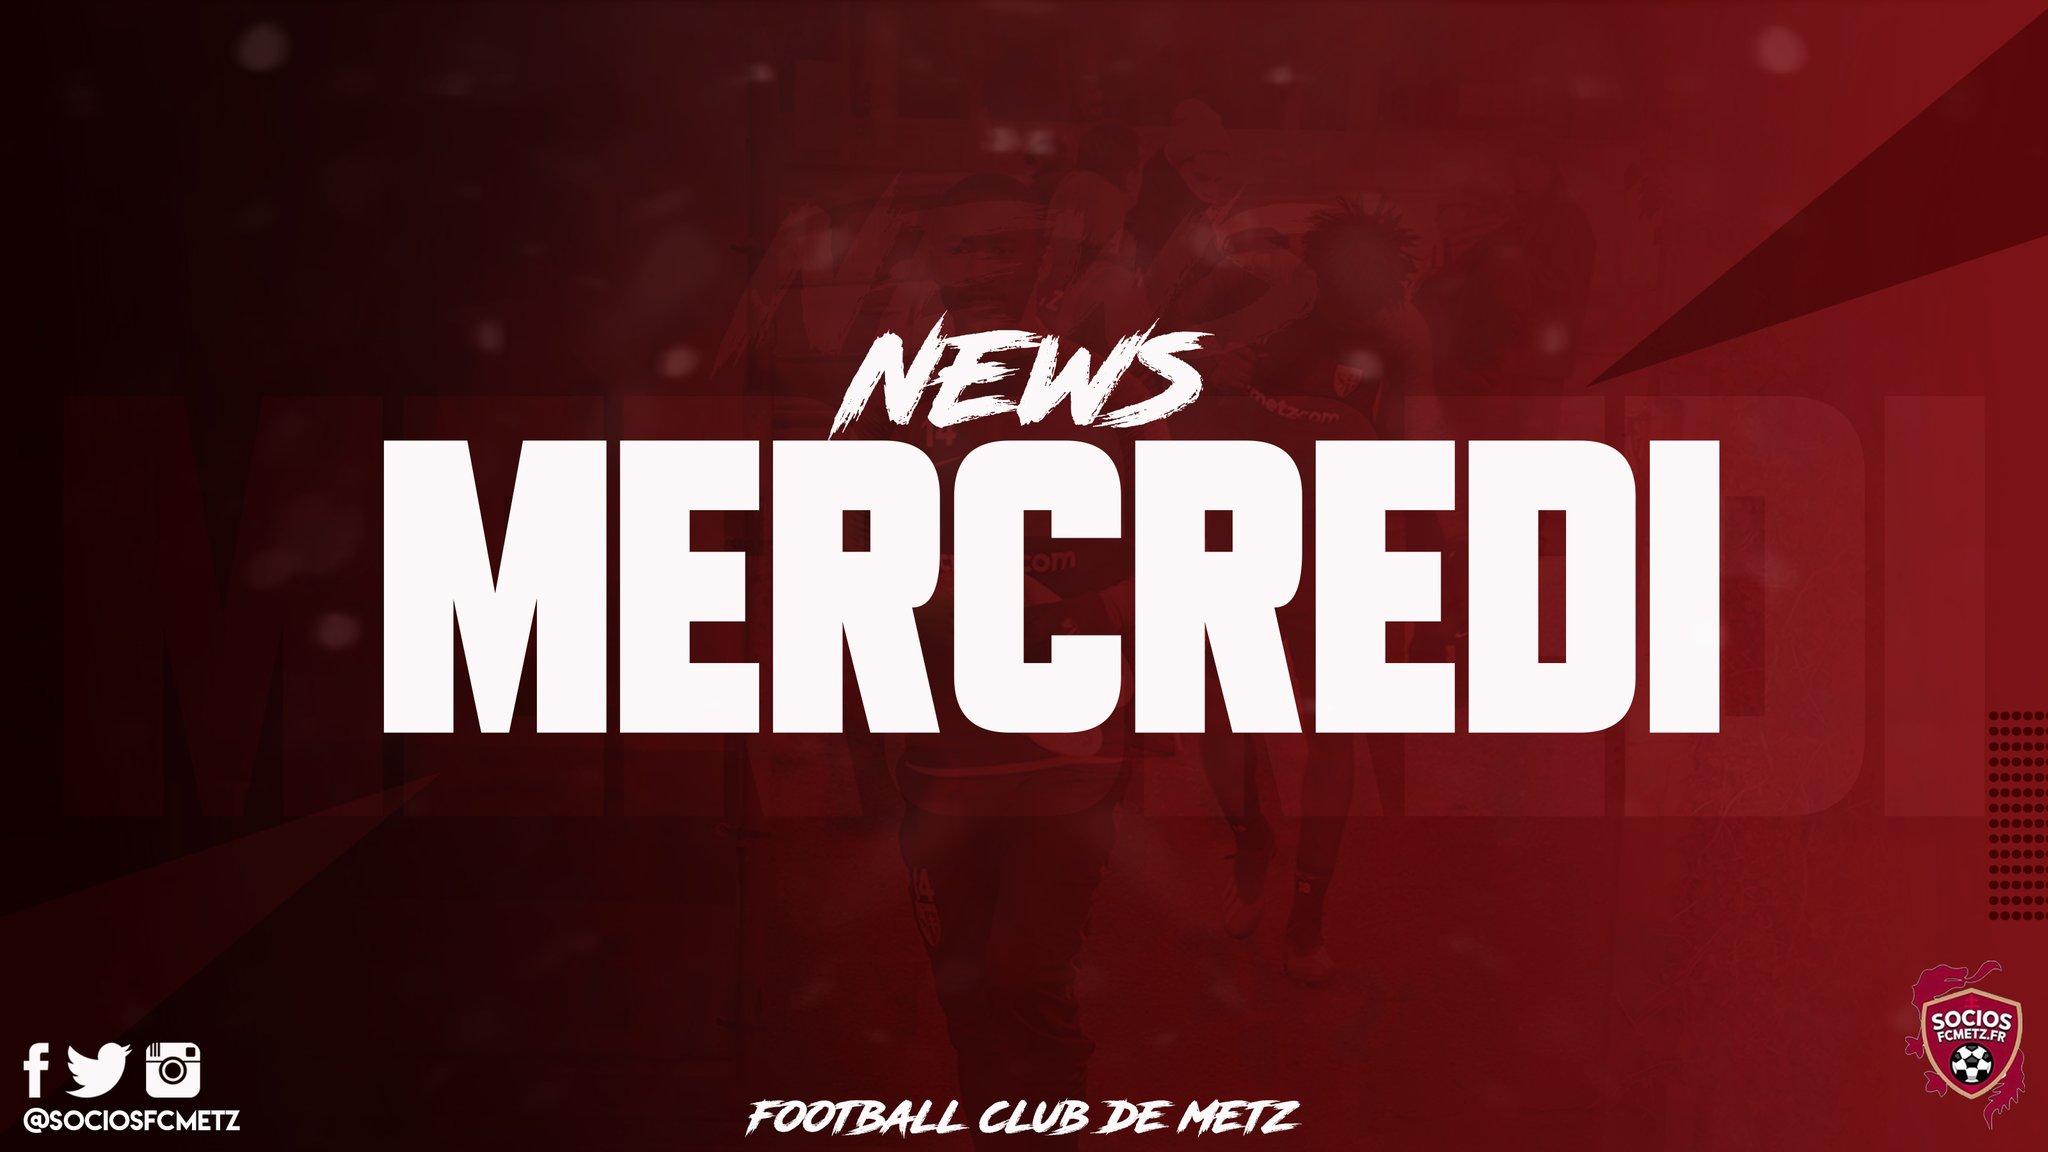 news mercredi